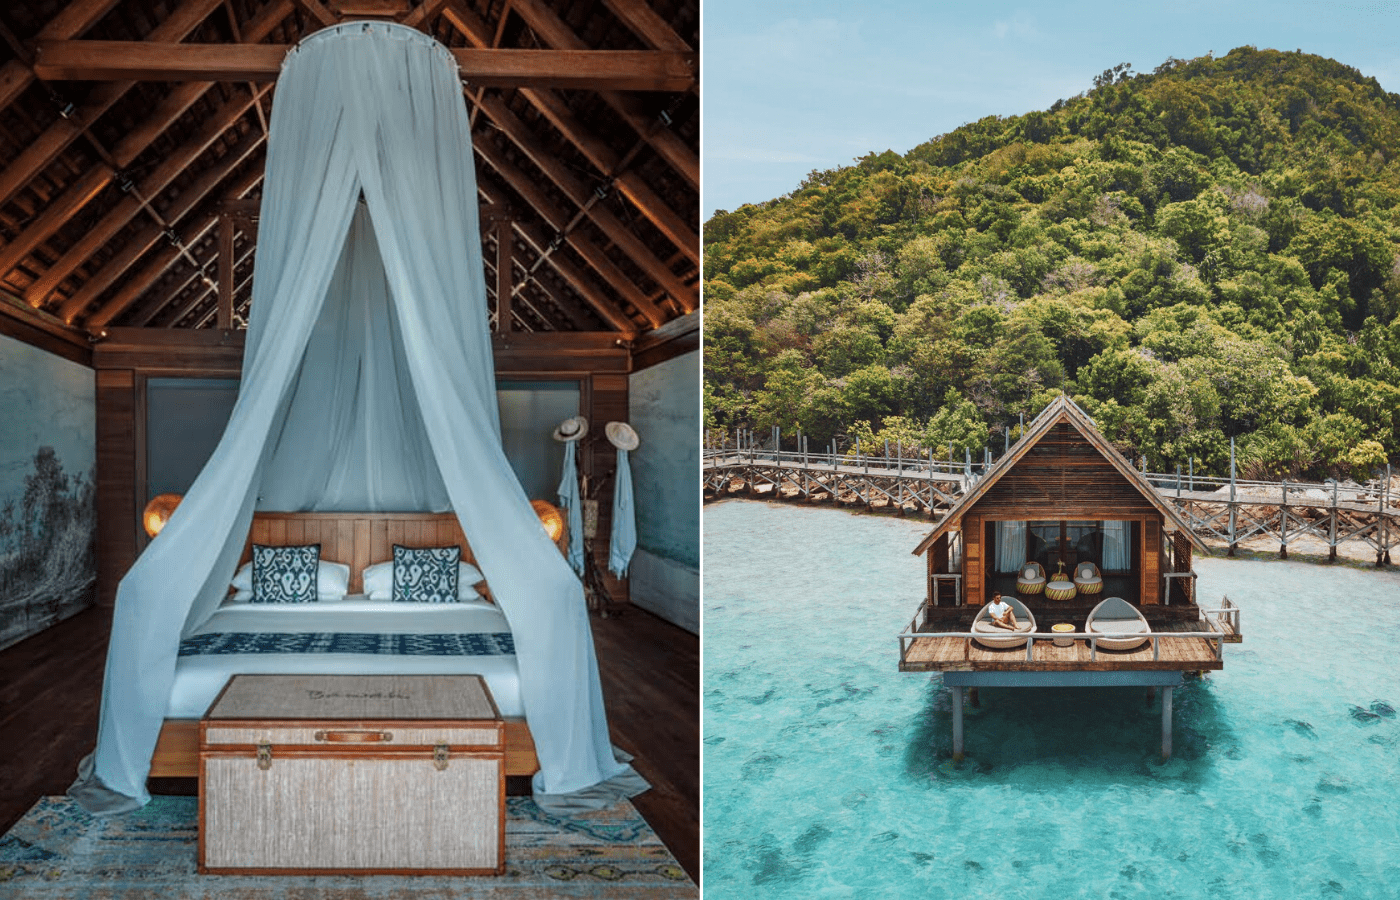 bawah island | private island resorts in Southeast Asia